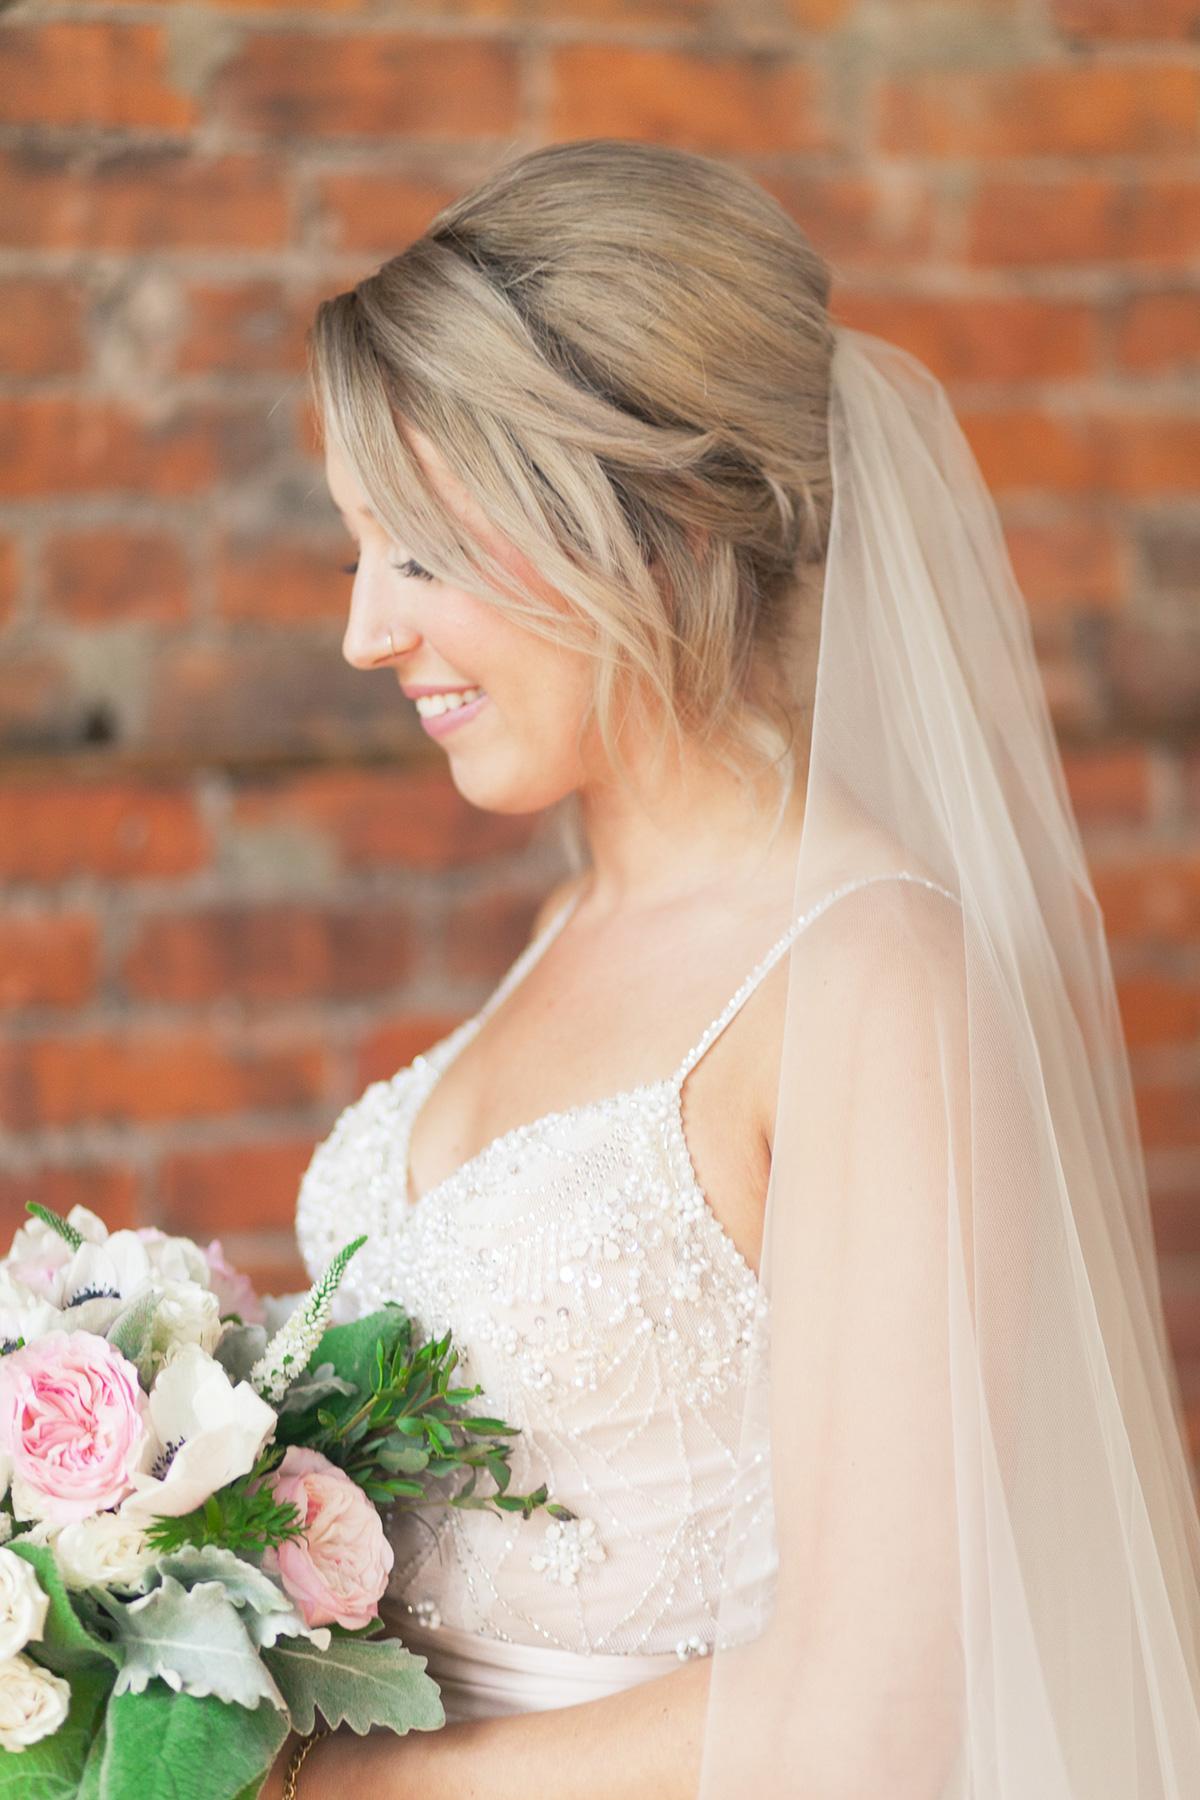 jennifer-xu-photography-vineyard-bride-swish-list-spice-factory-hamilton-wedding-20.jpg